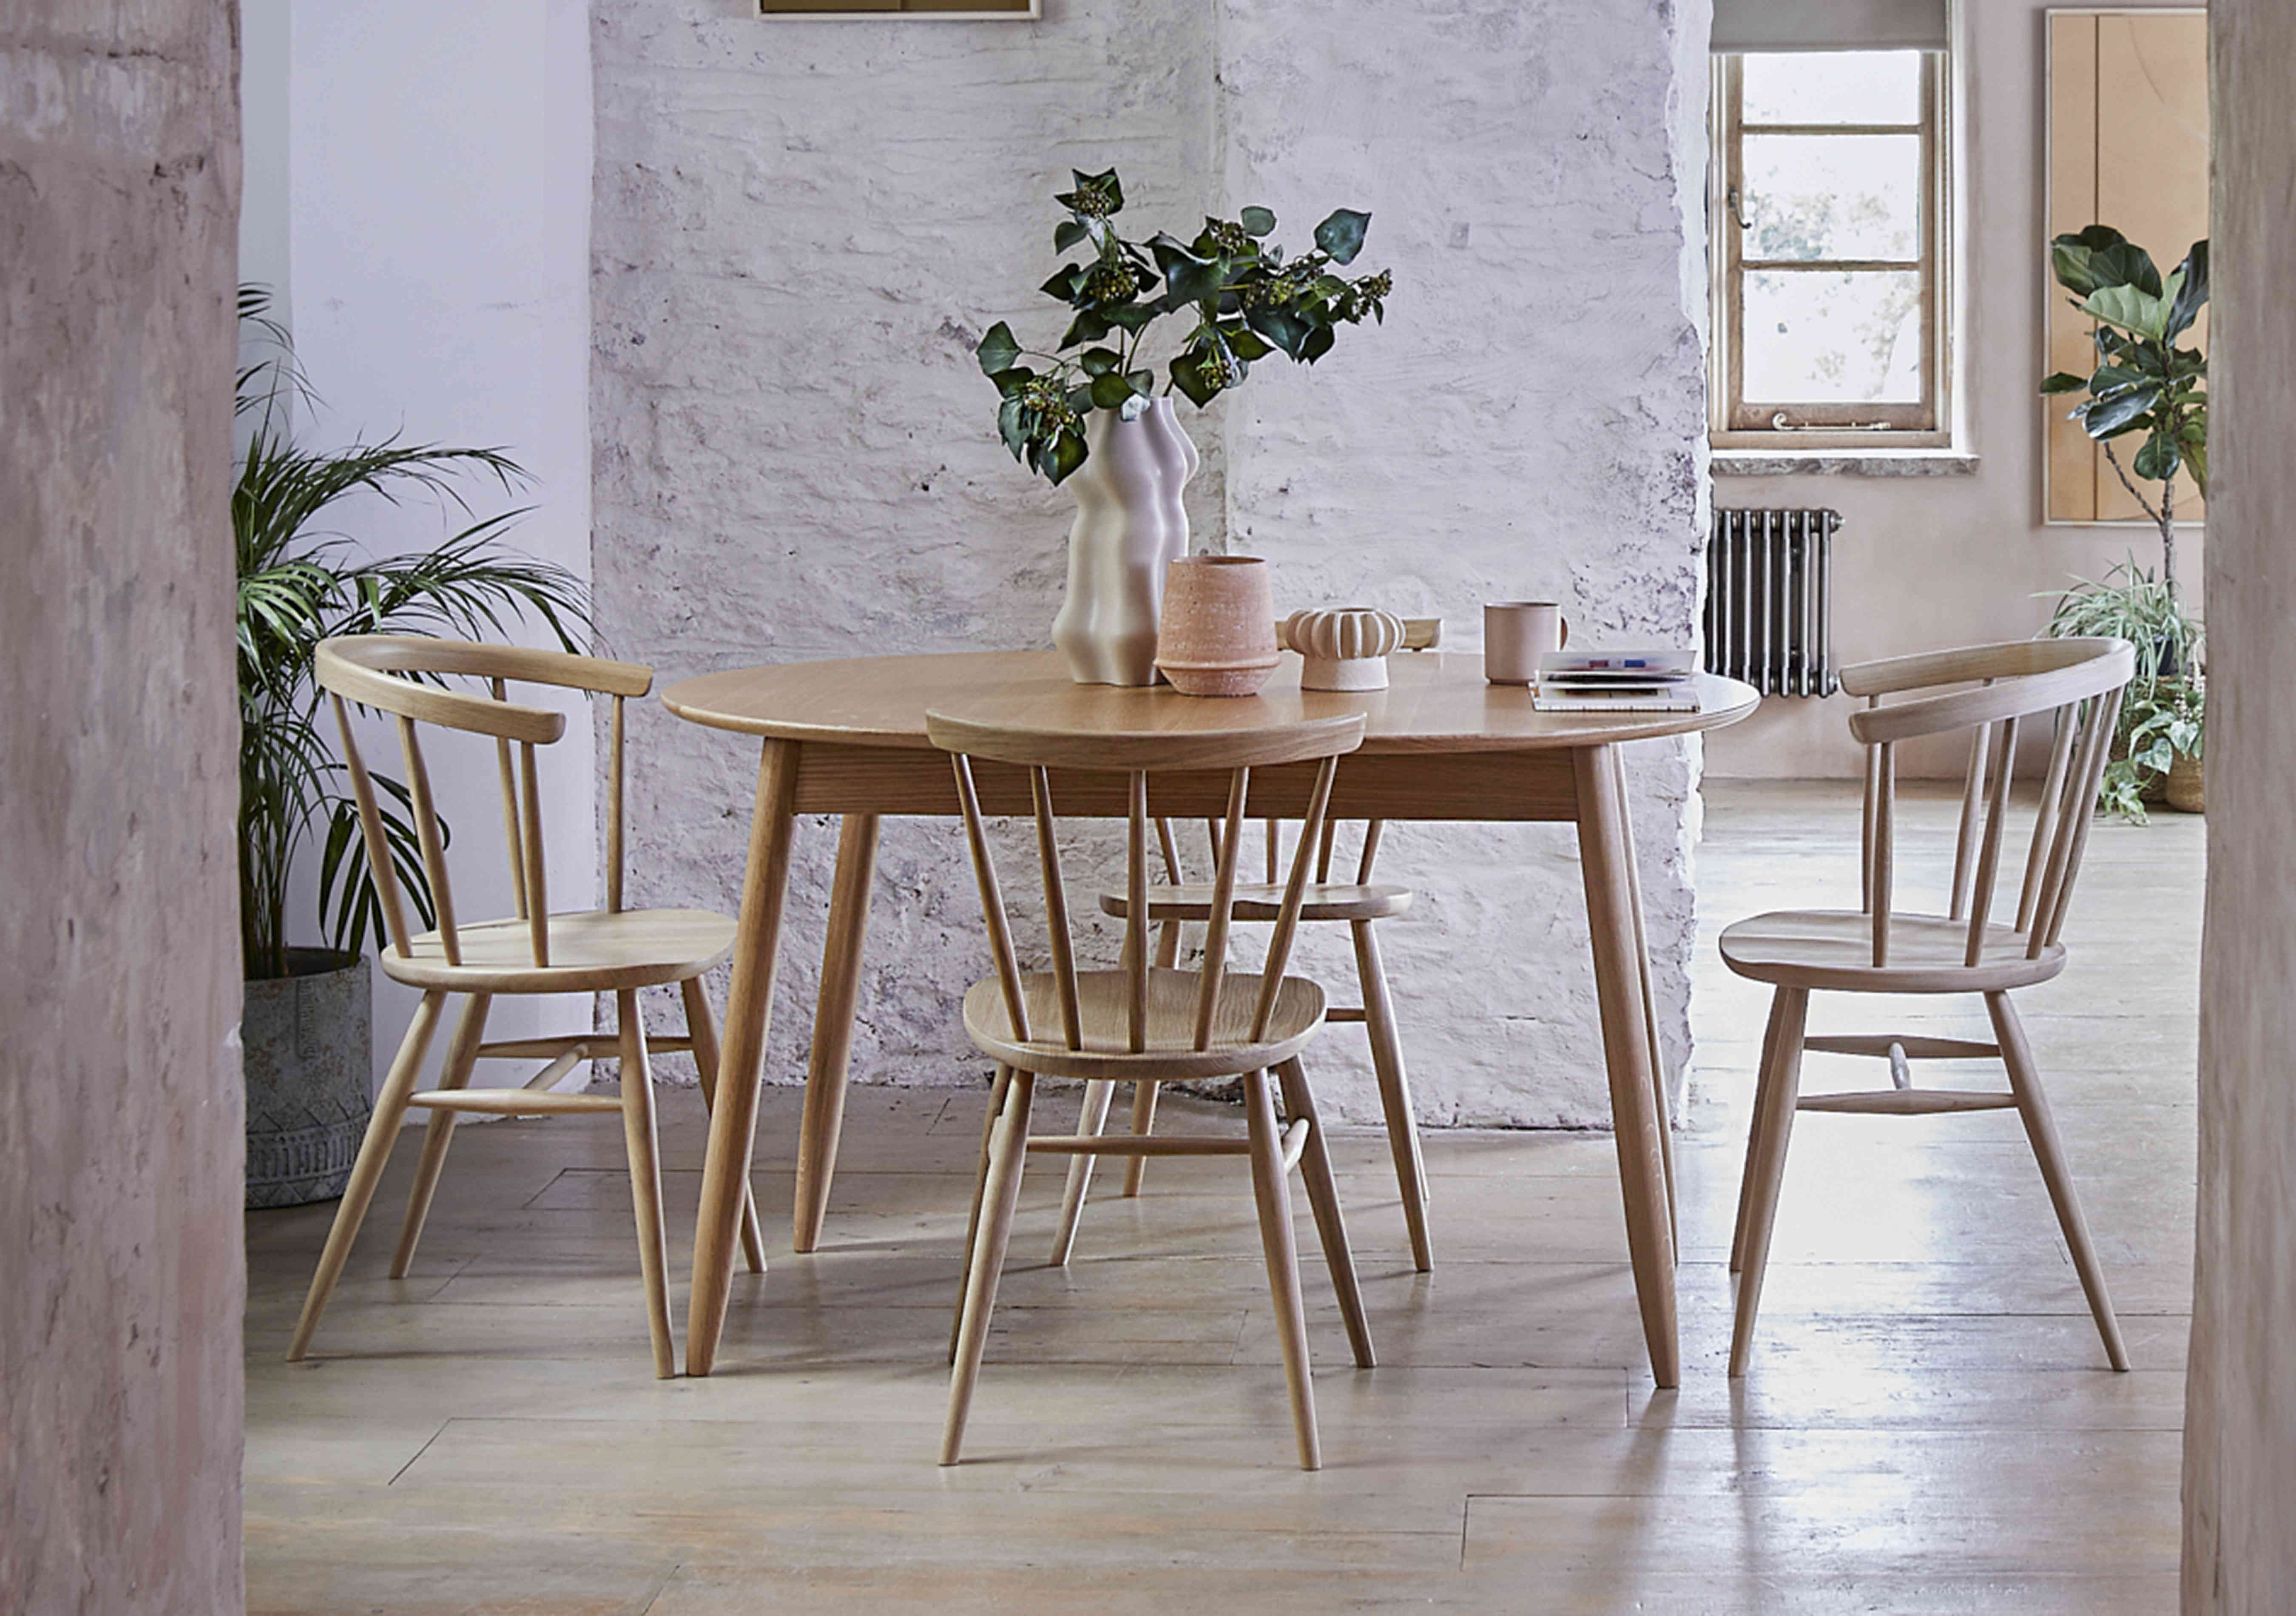 Furniture Village Dining Tables teramo small extending dining table - ercol - furniture village